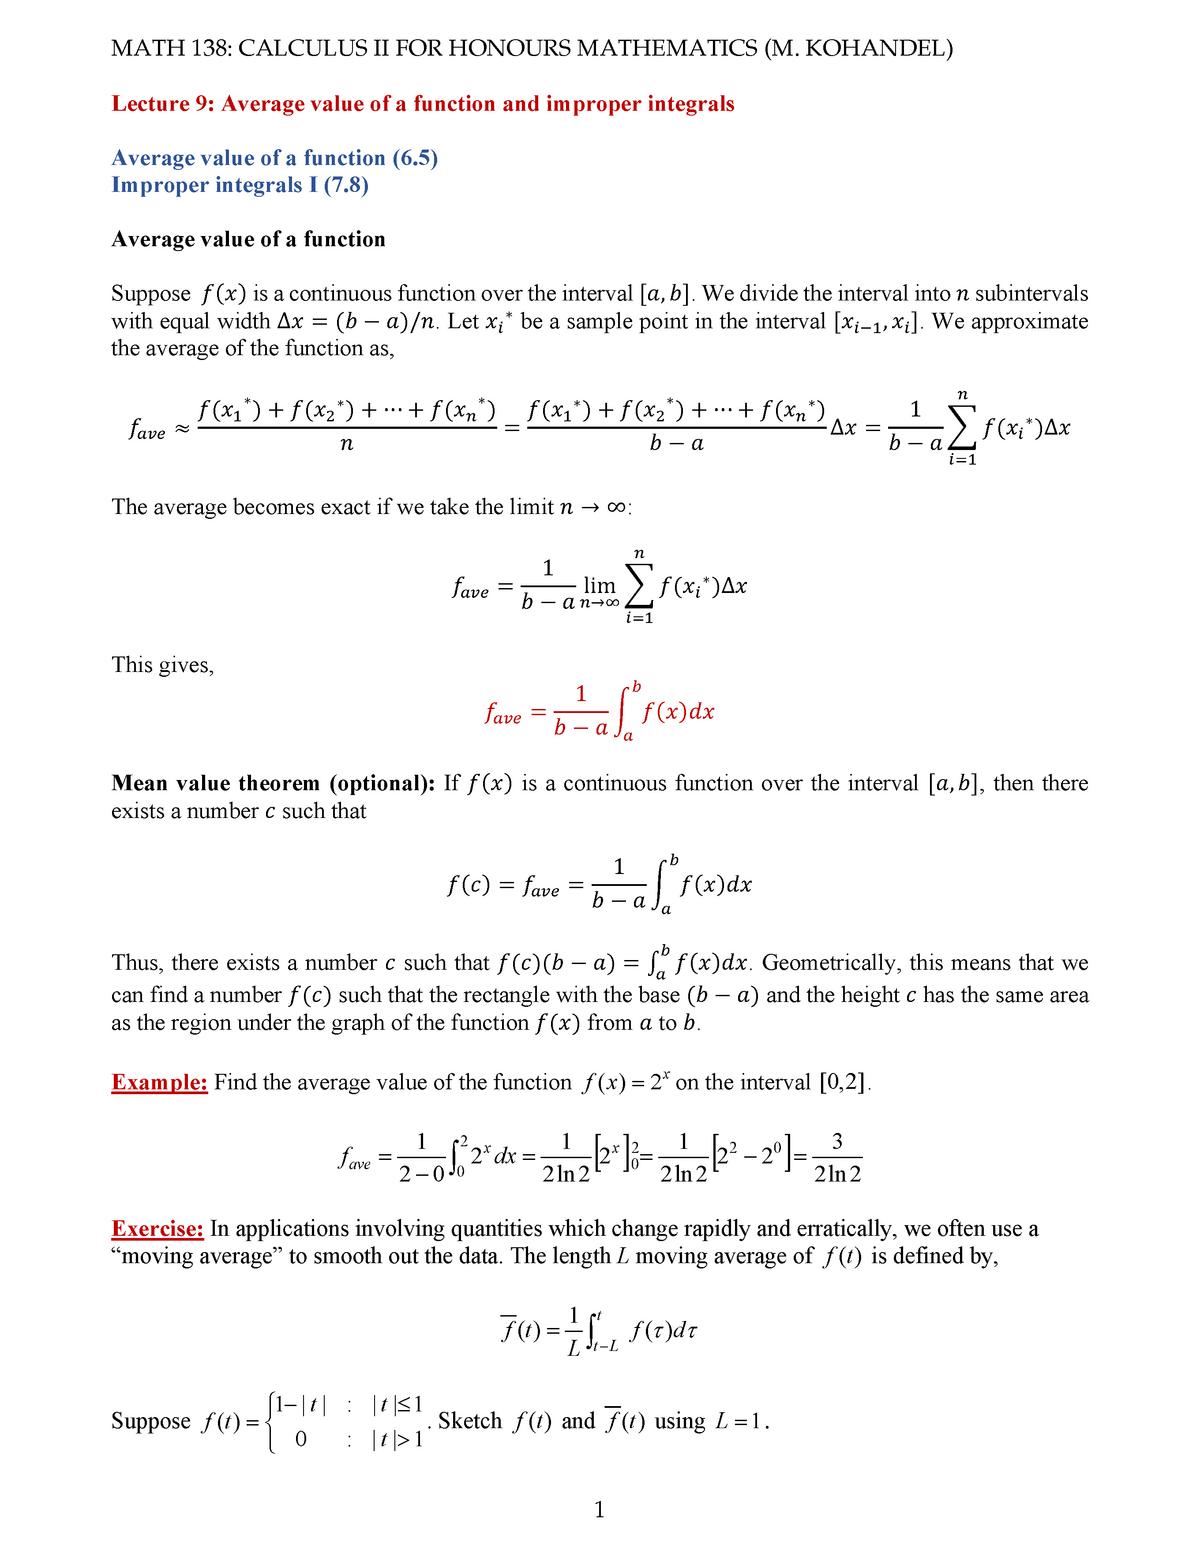 Math138-Lecture 9 - waterloo - Math 138 - StuDocu